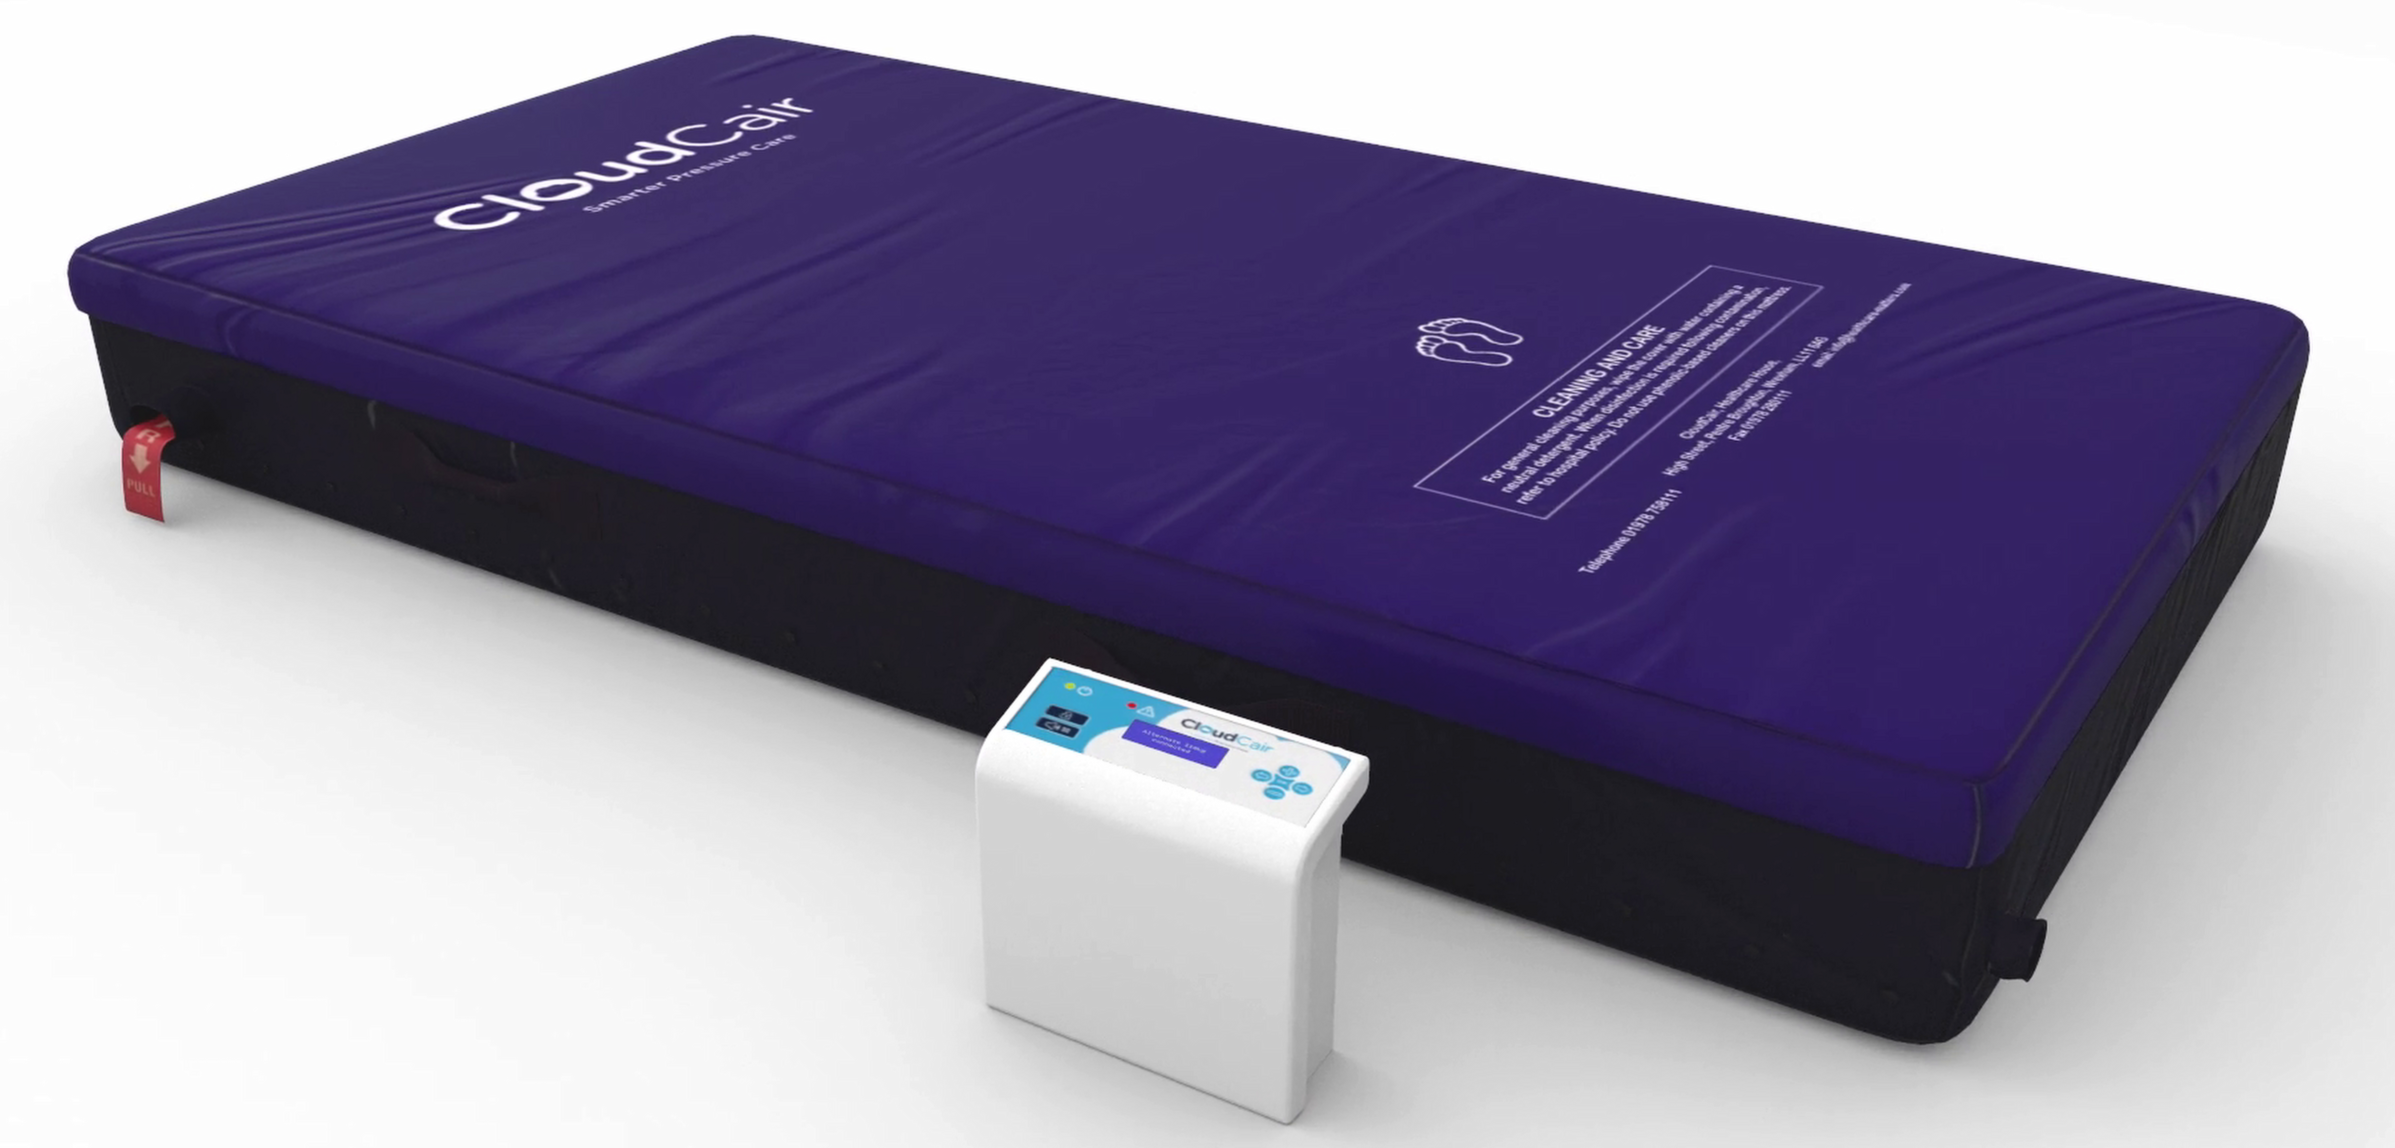 Smarter Pressure Care - CloudCair